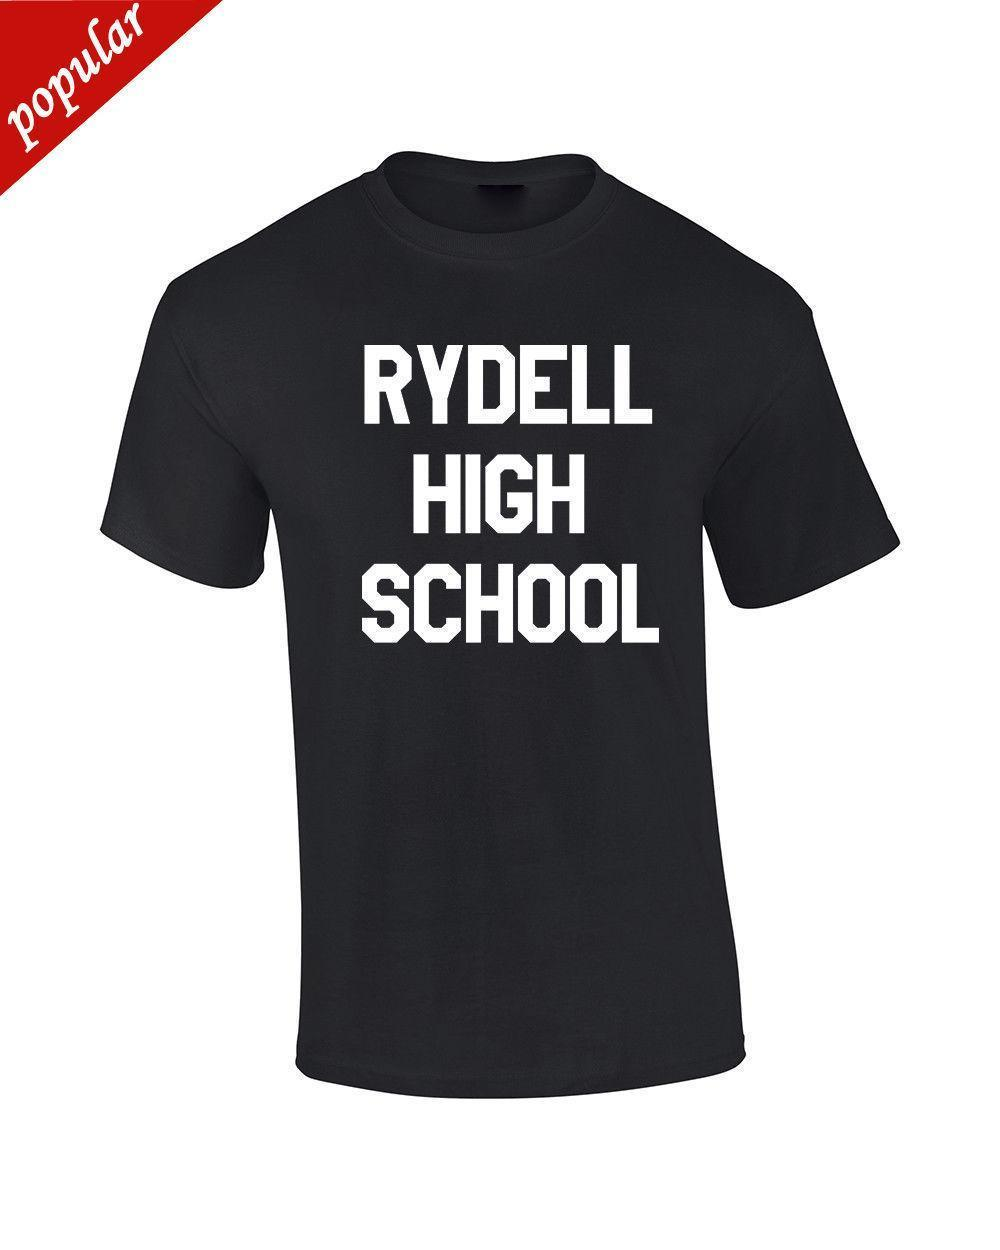 Rydell High School Grease Inspired Mens Tshirt Womens Tshirt Movie